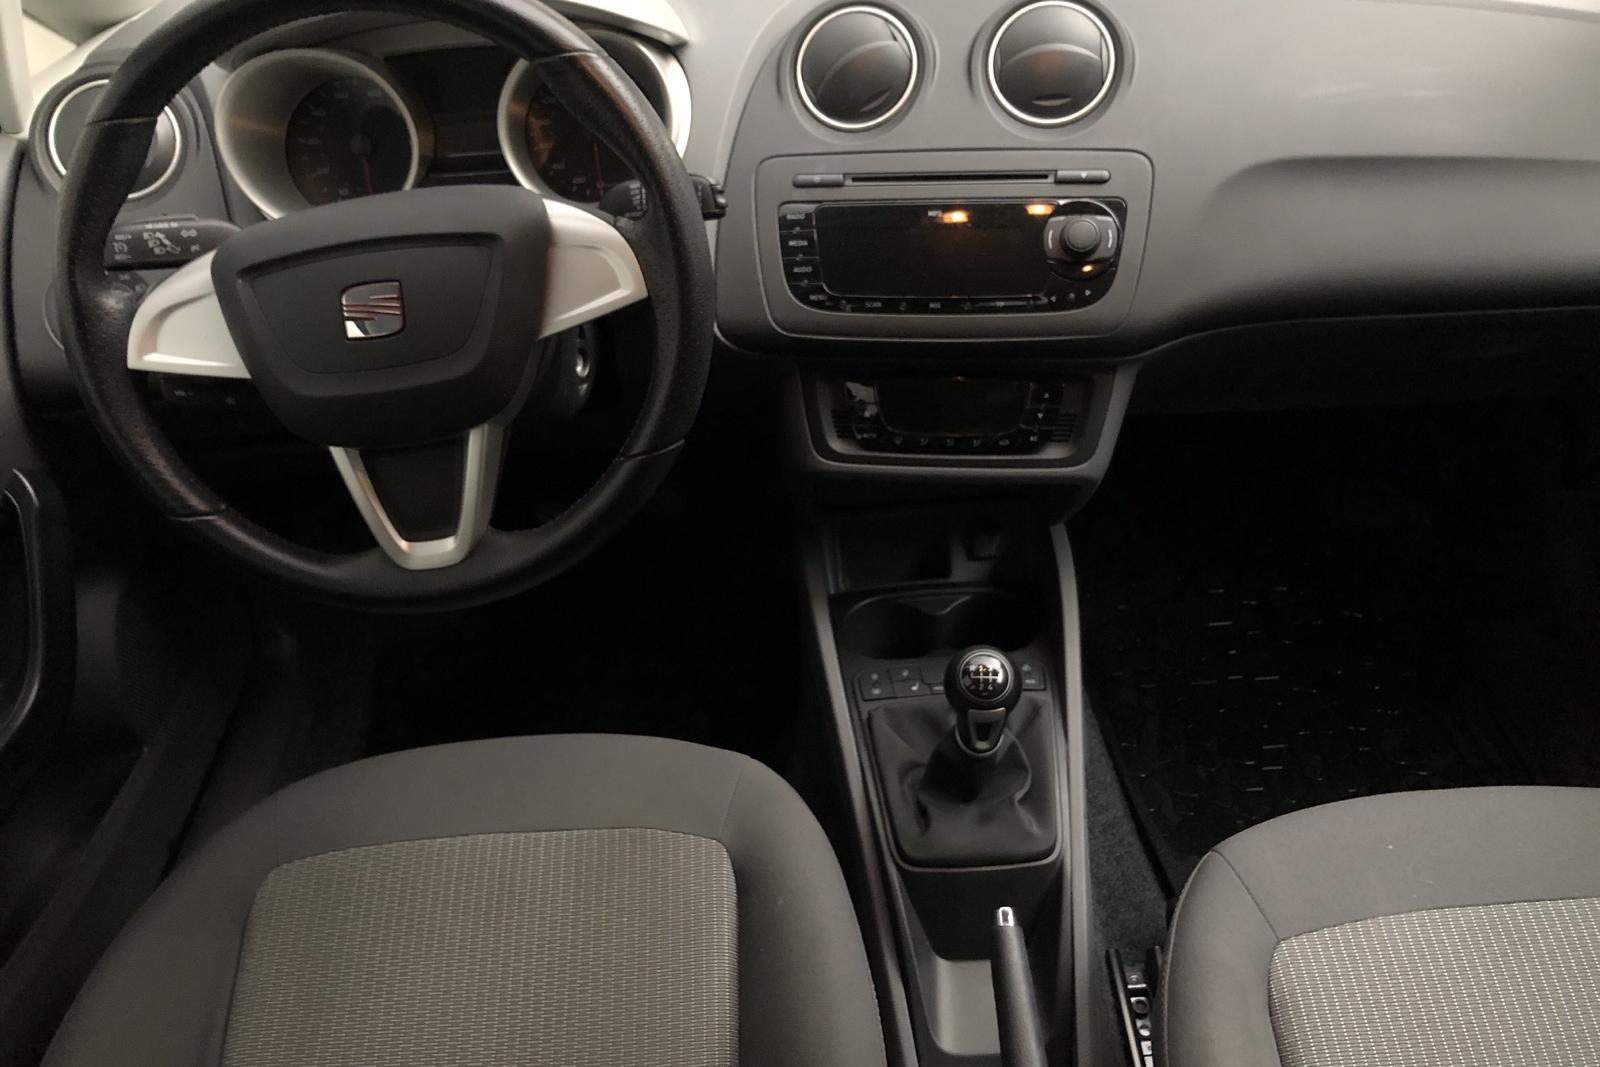 Seat Ibiza 1.4 ST (85hk) - 87 710 km - Manual - Dark Grey - 2011